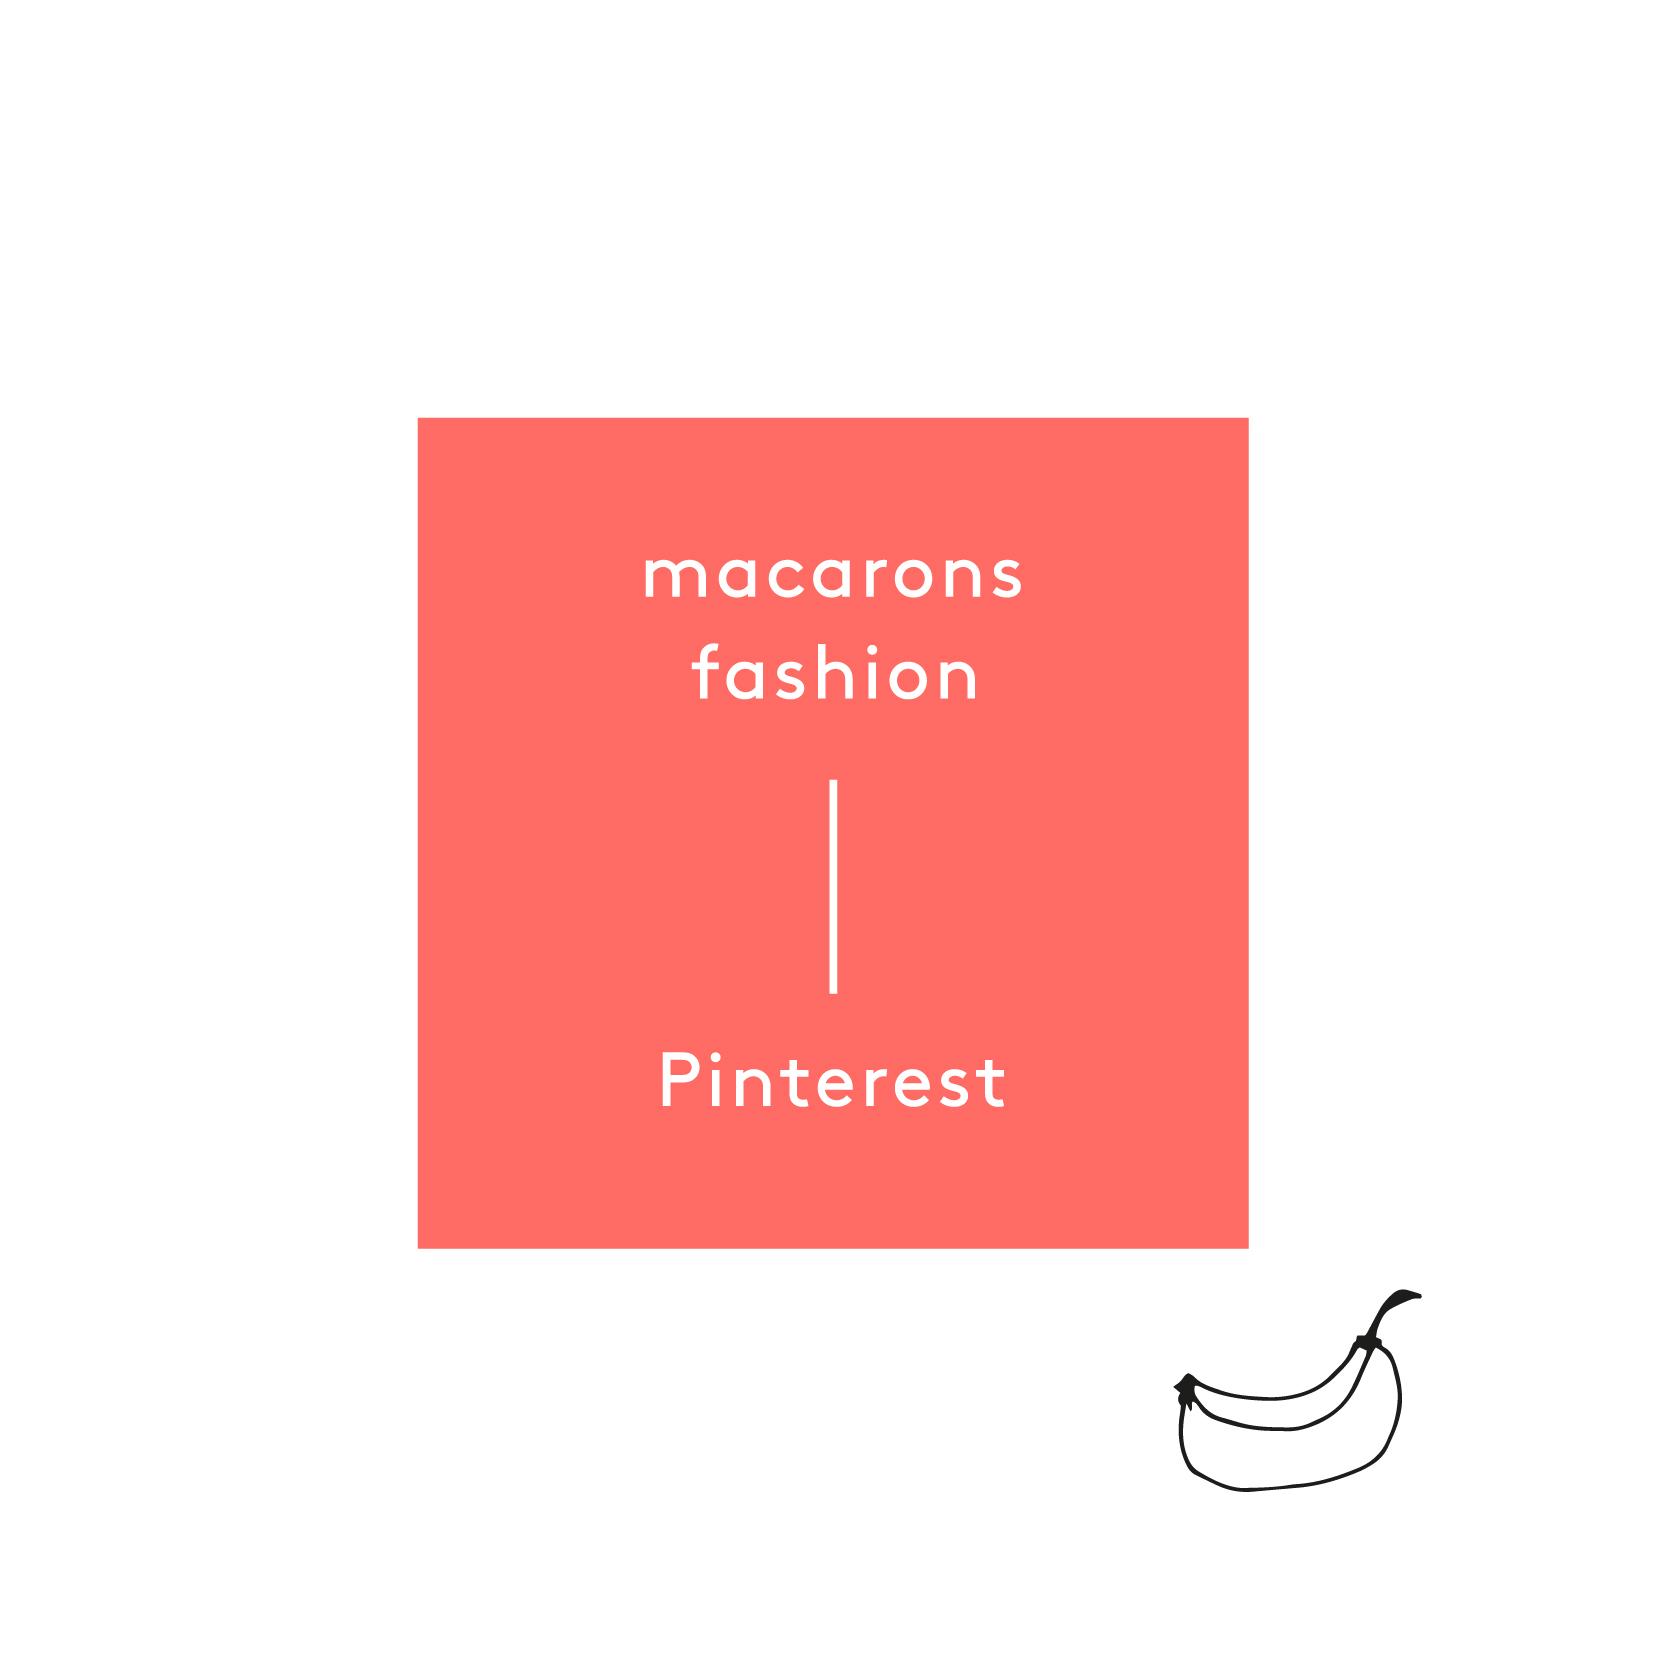 macarons_blog_pinterest-01-01